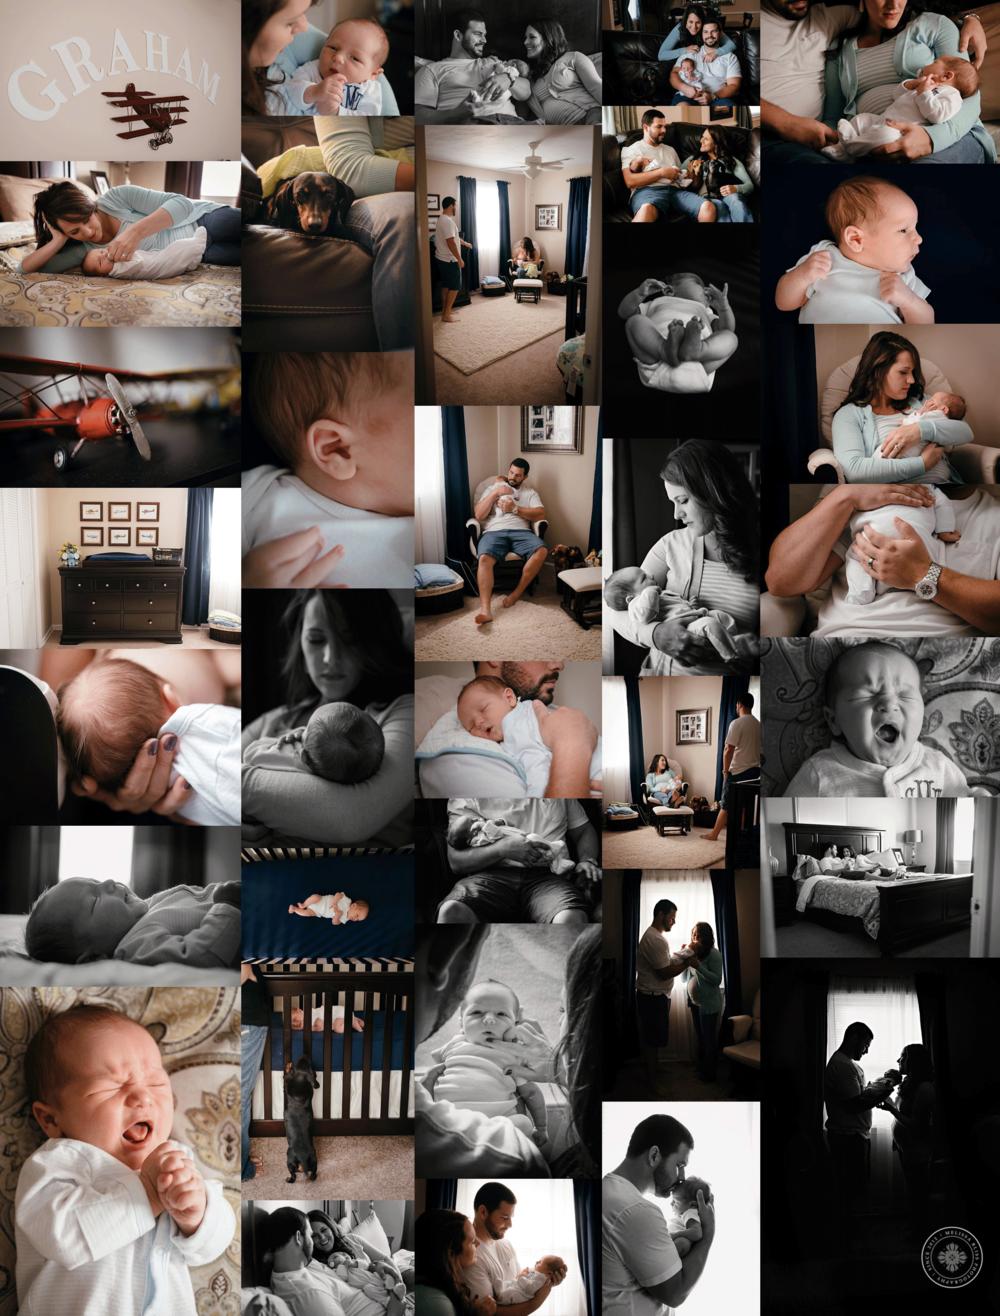 newborn-lifestyle-photography-newborn-session-in-home-newborn-photography-virginia-beach-norfolk-photographer-melissa-bliss-photography-documentary-newborn-photos